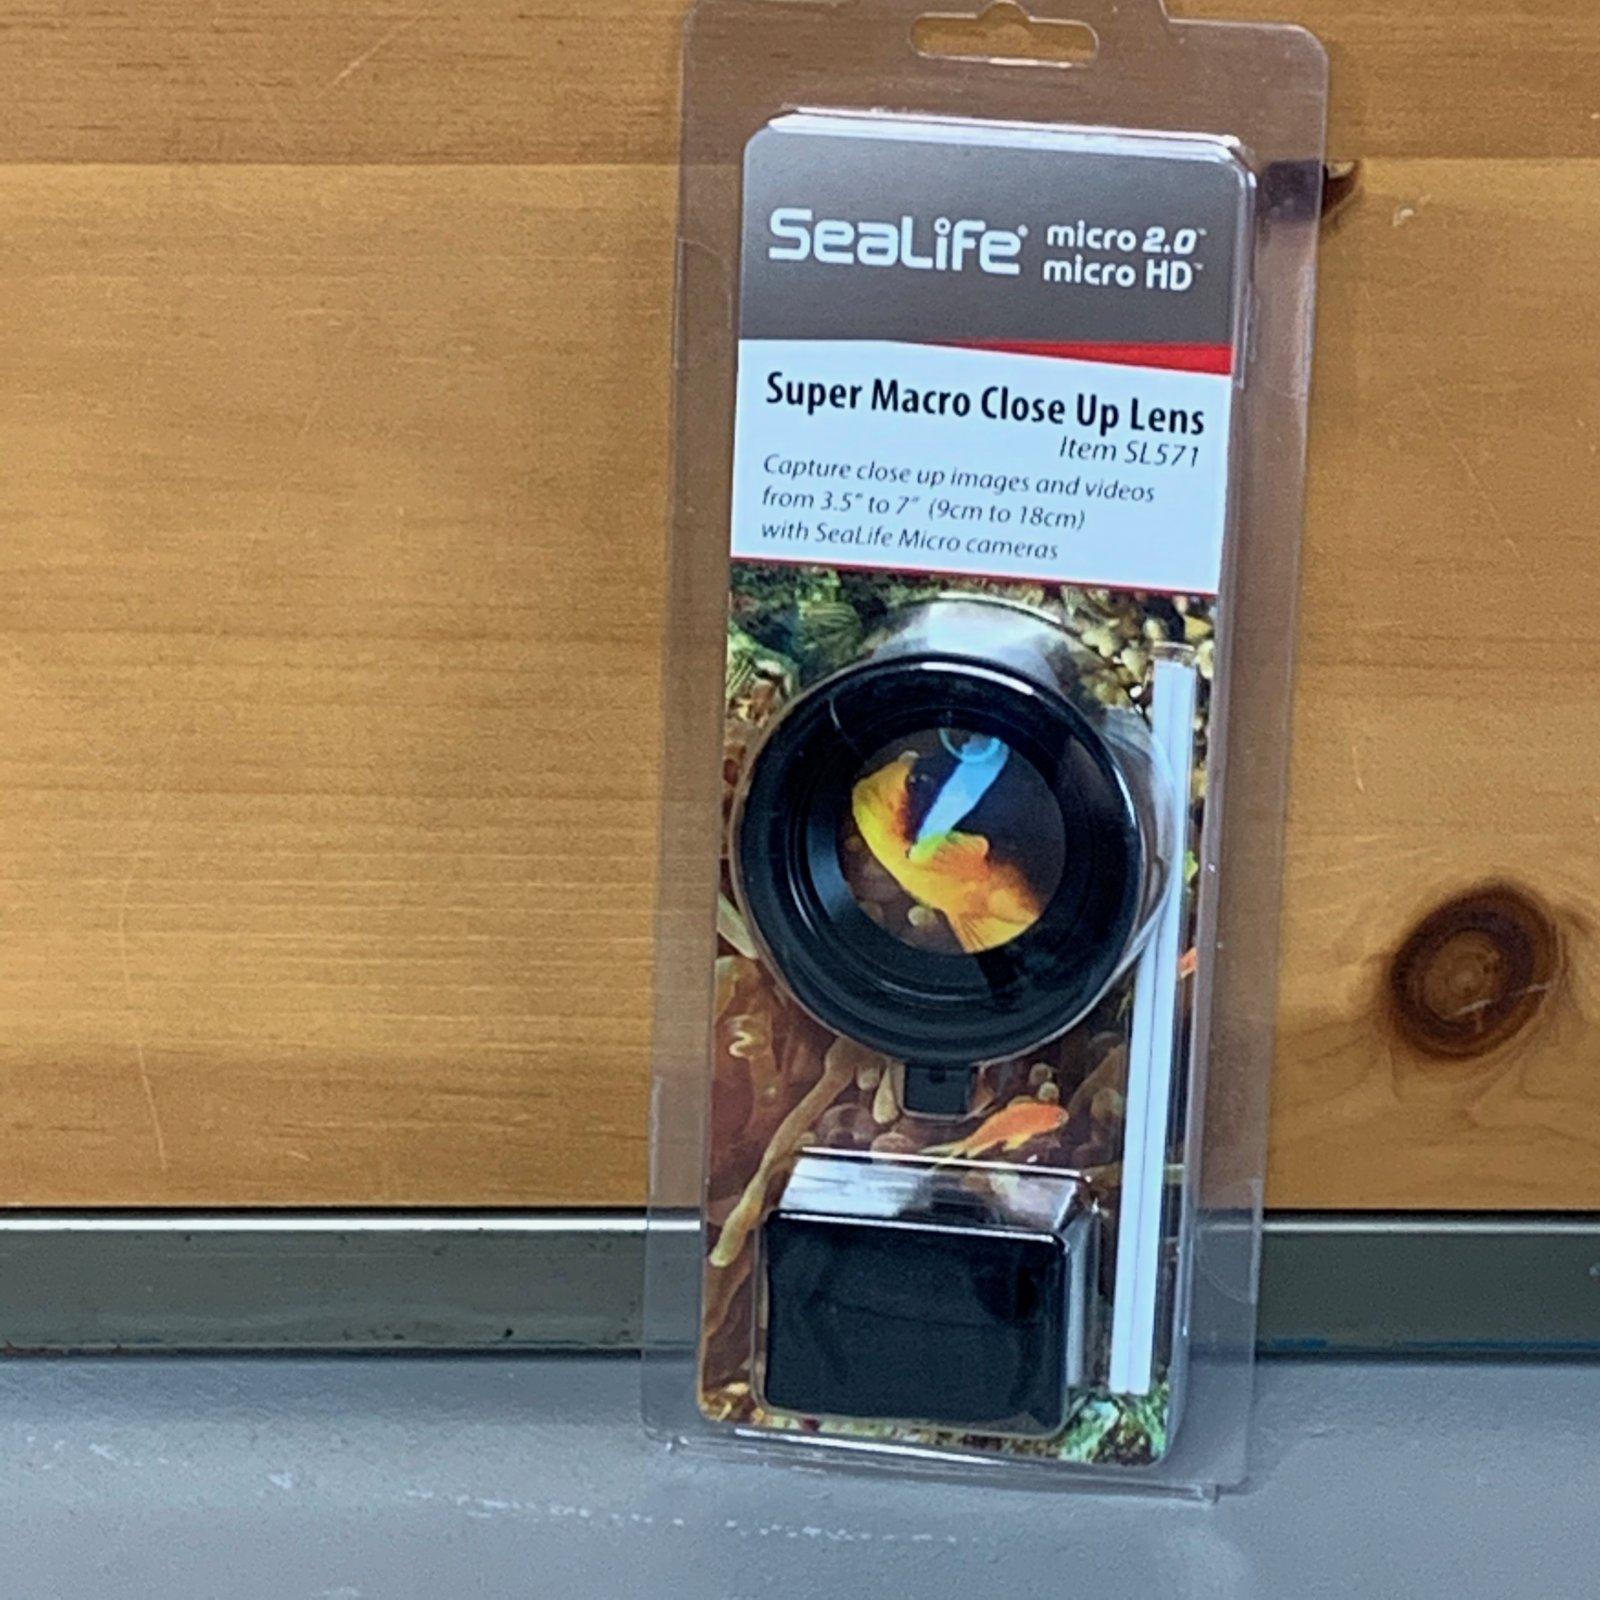 Super Macro Close-Up Lens For Micro